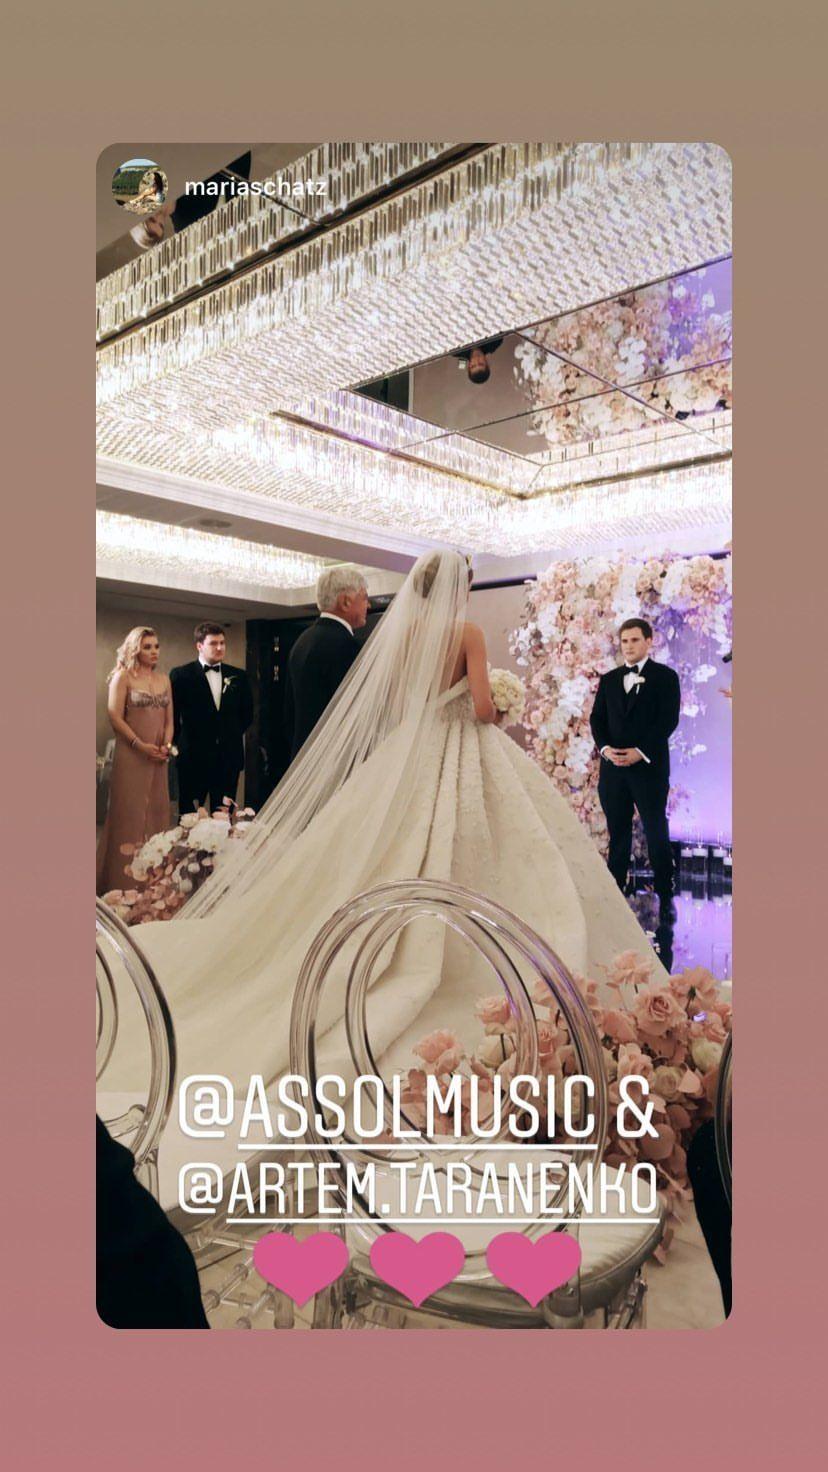 Весілля Ассоль_2